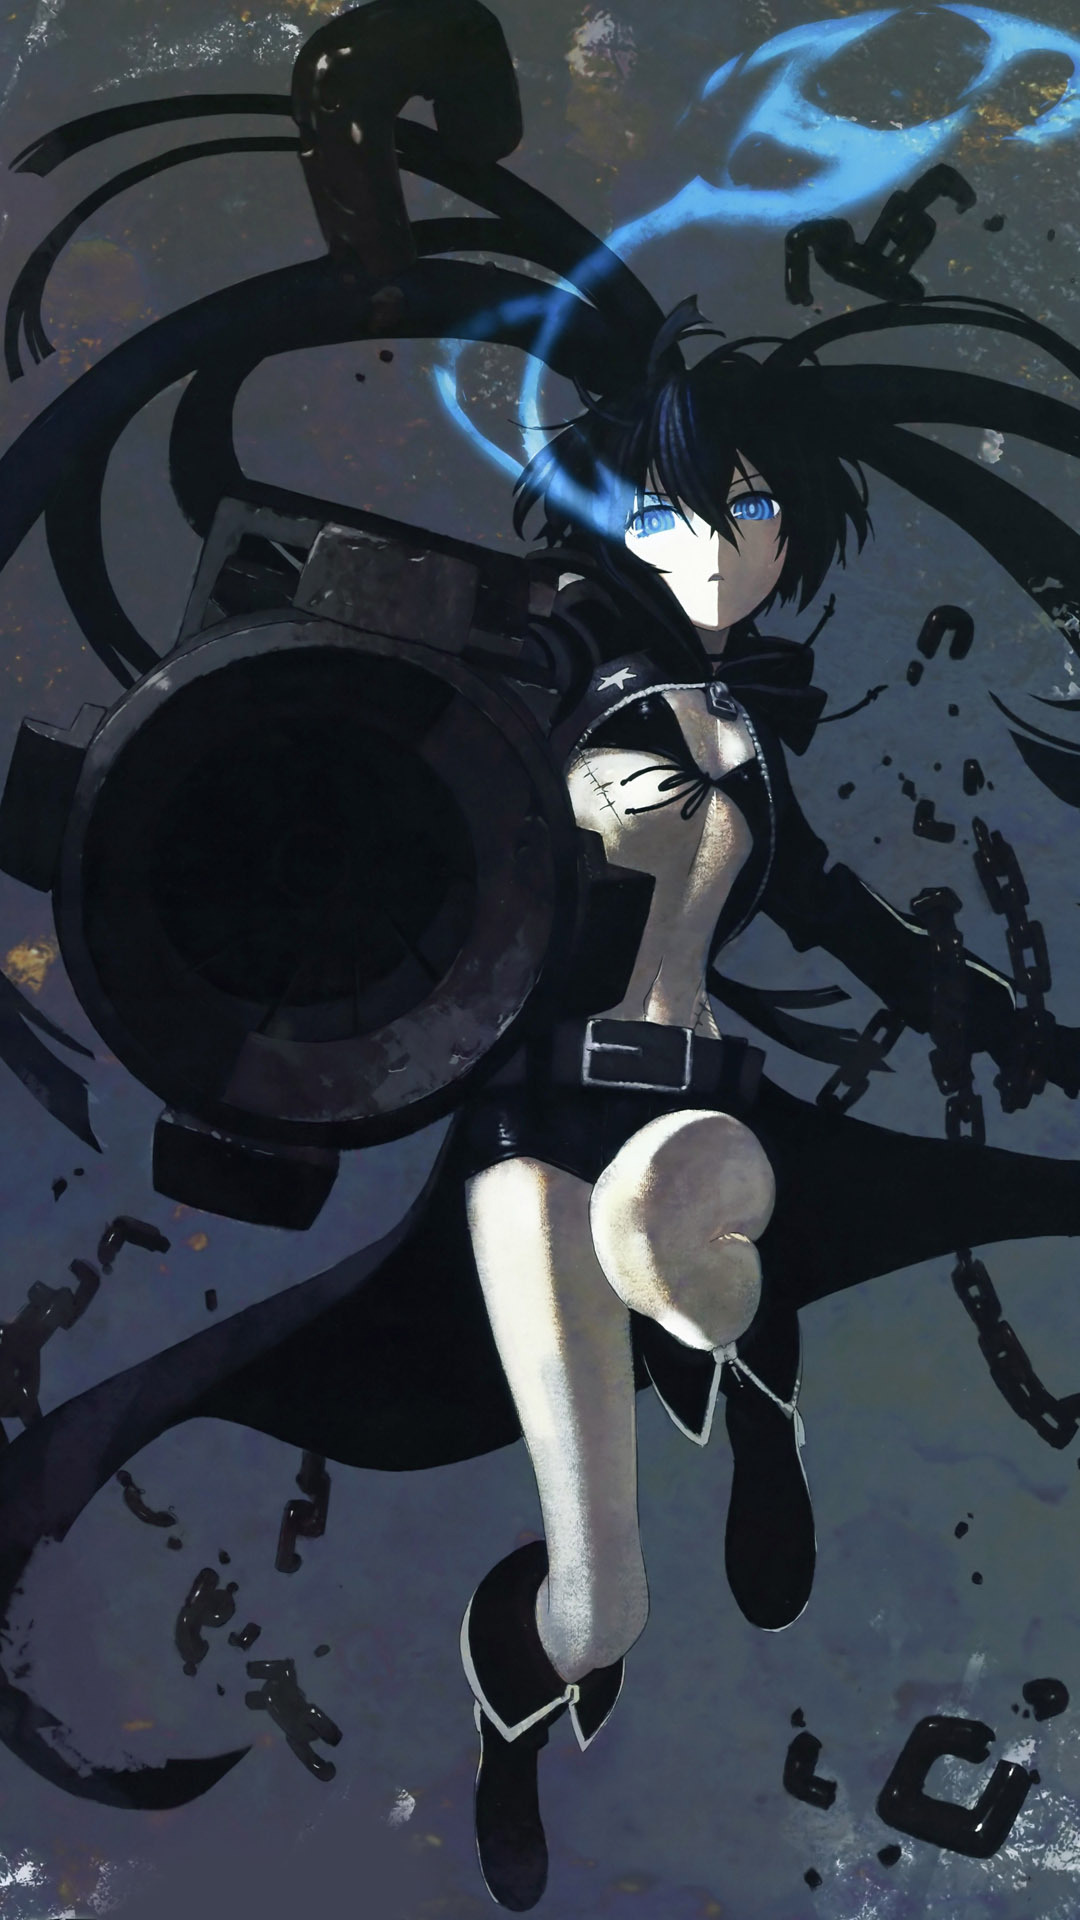 Black-rock-shooter-anime-mobile-wallpaper-1080x1920-12826